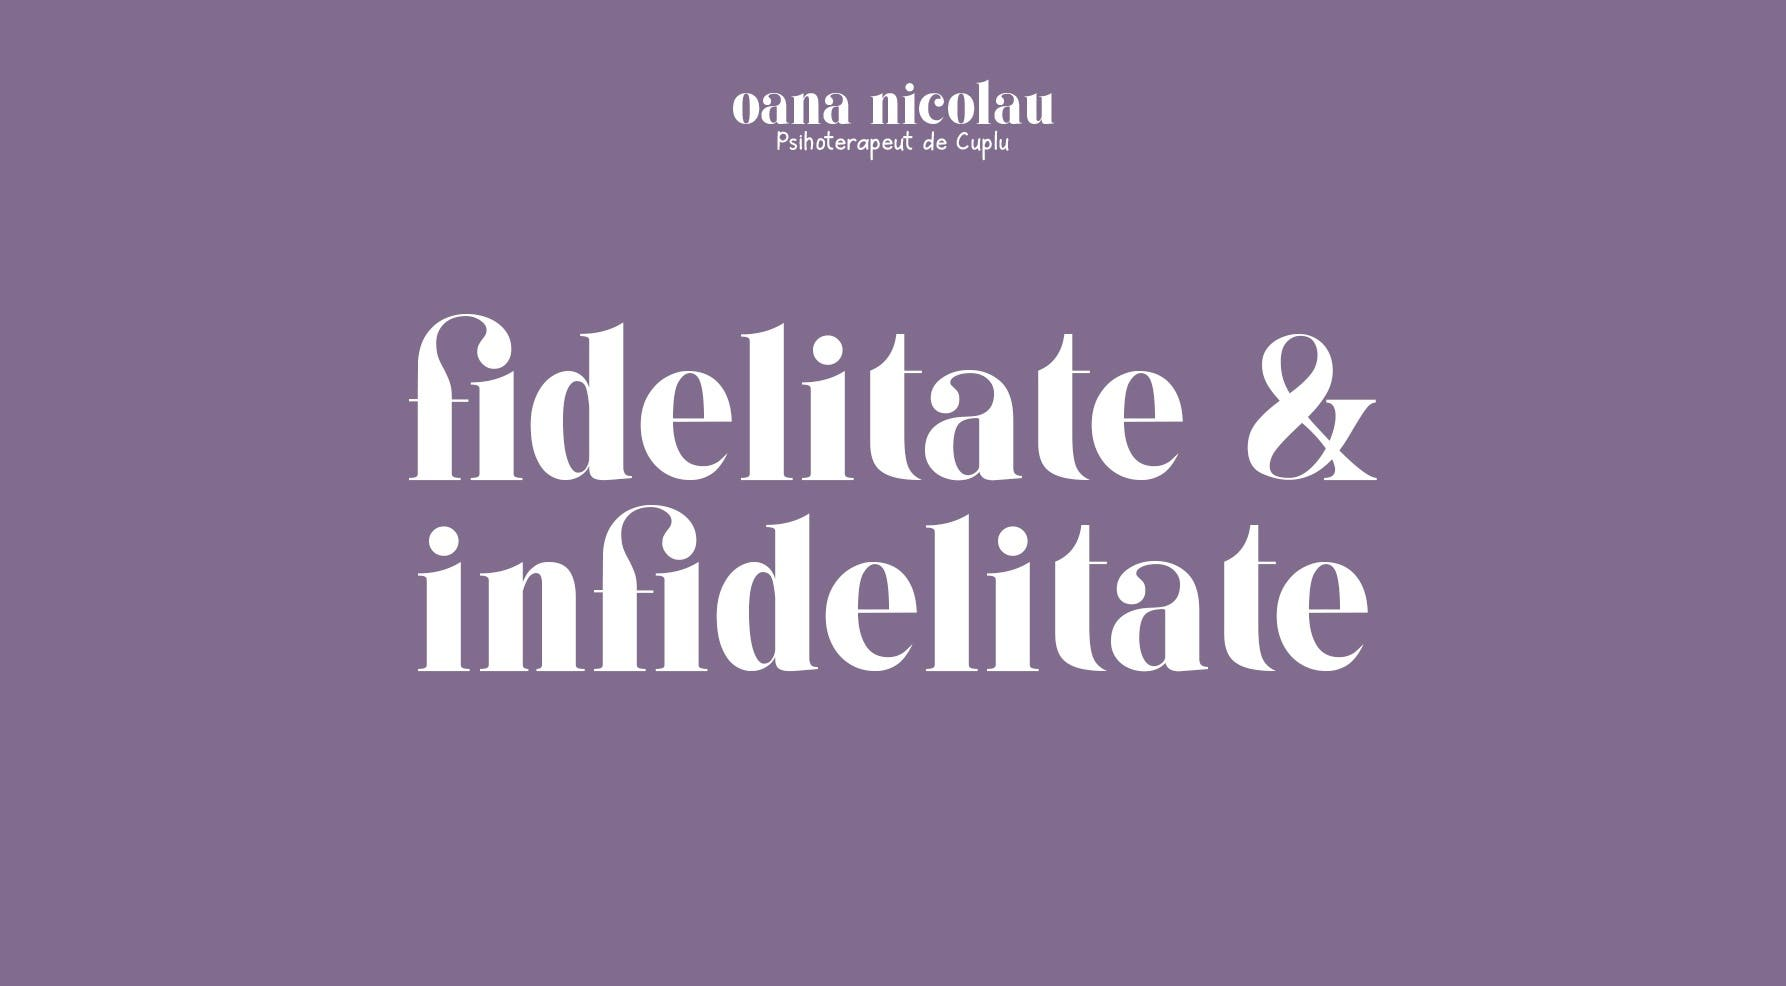 Fidelitate si infidelitate